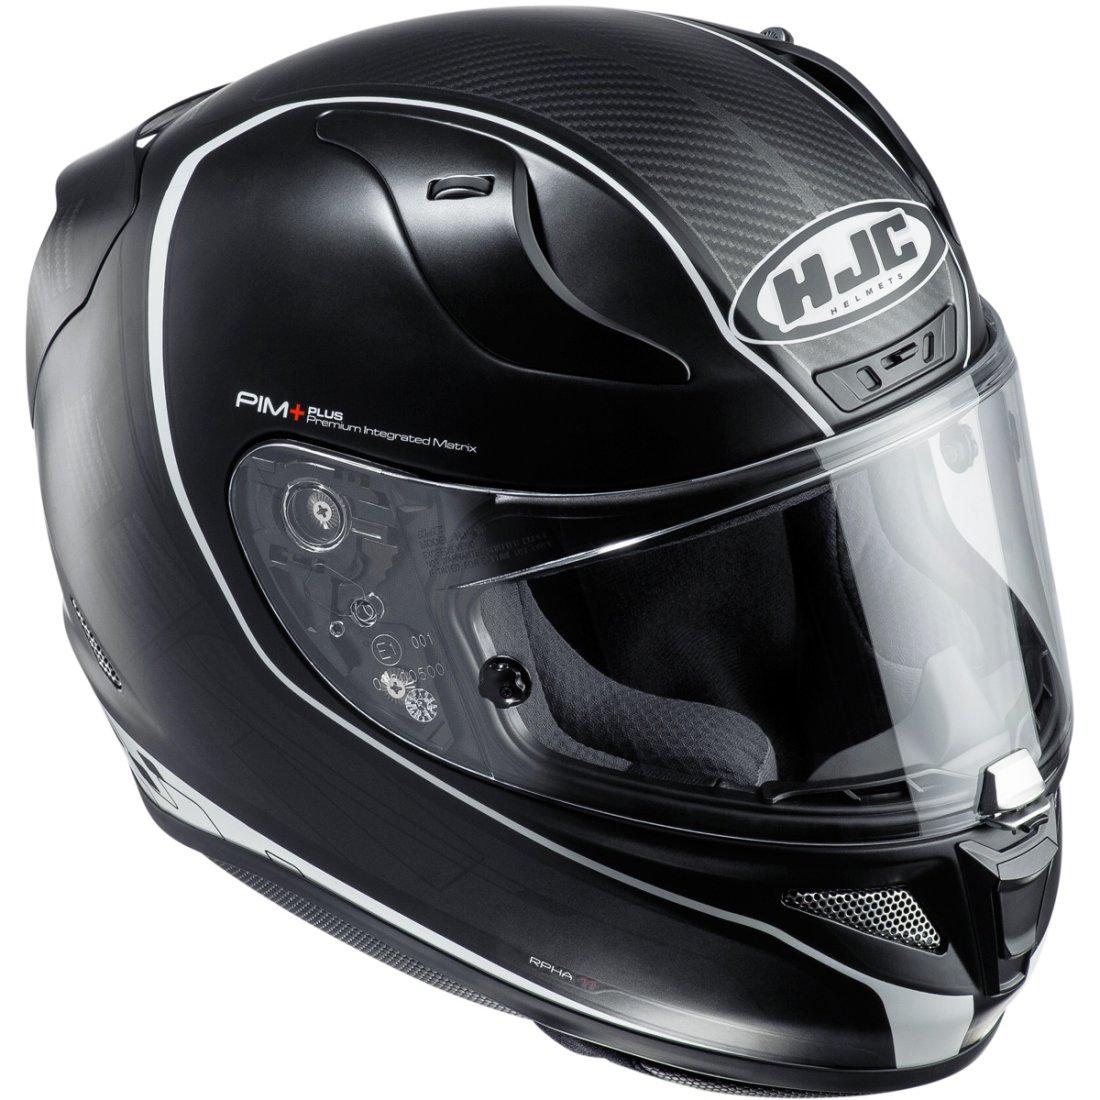 hjc rpha 11 riberte mc 5sf helmet motocard. Black Bedroom Furniture Sets. Home Design Ideas